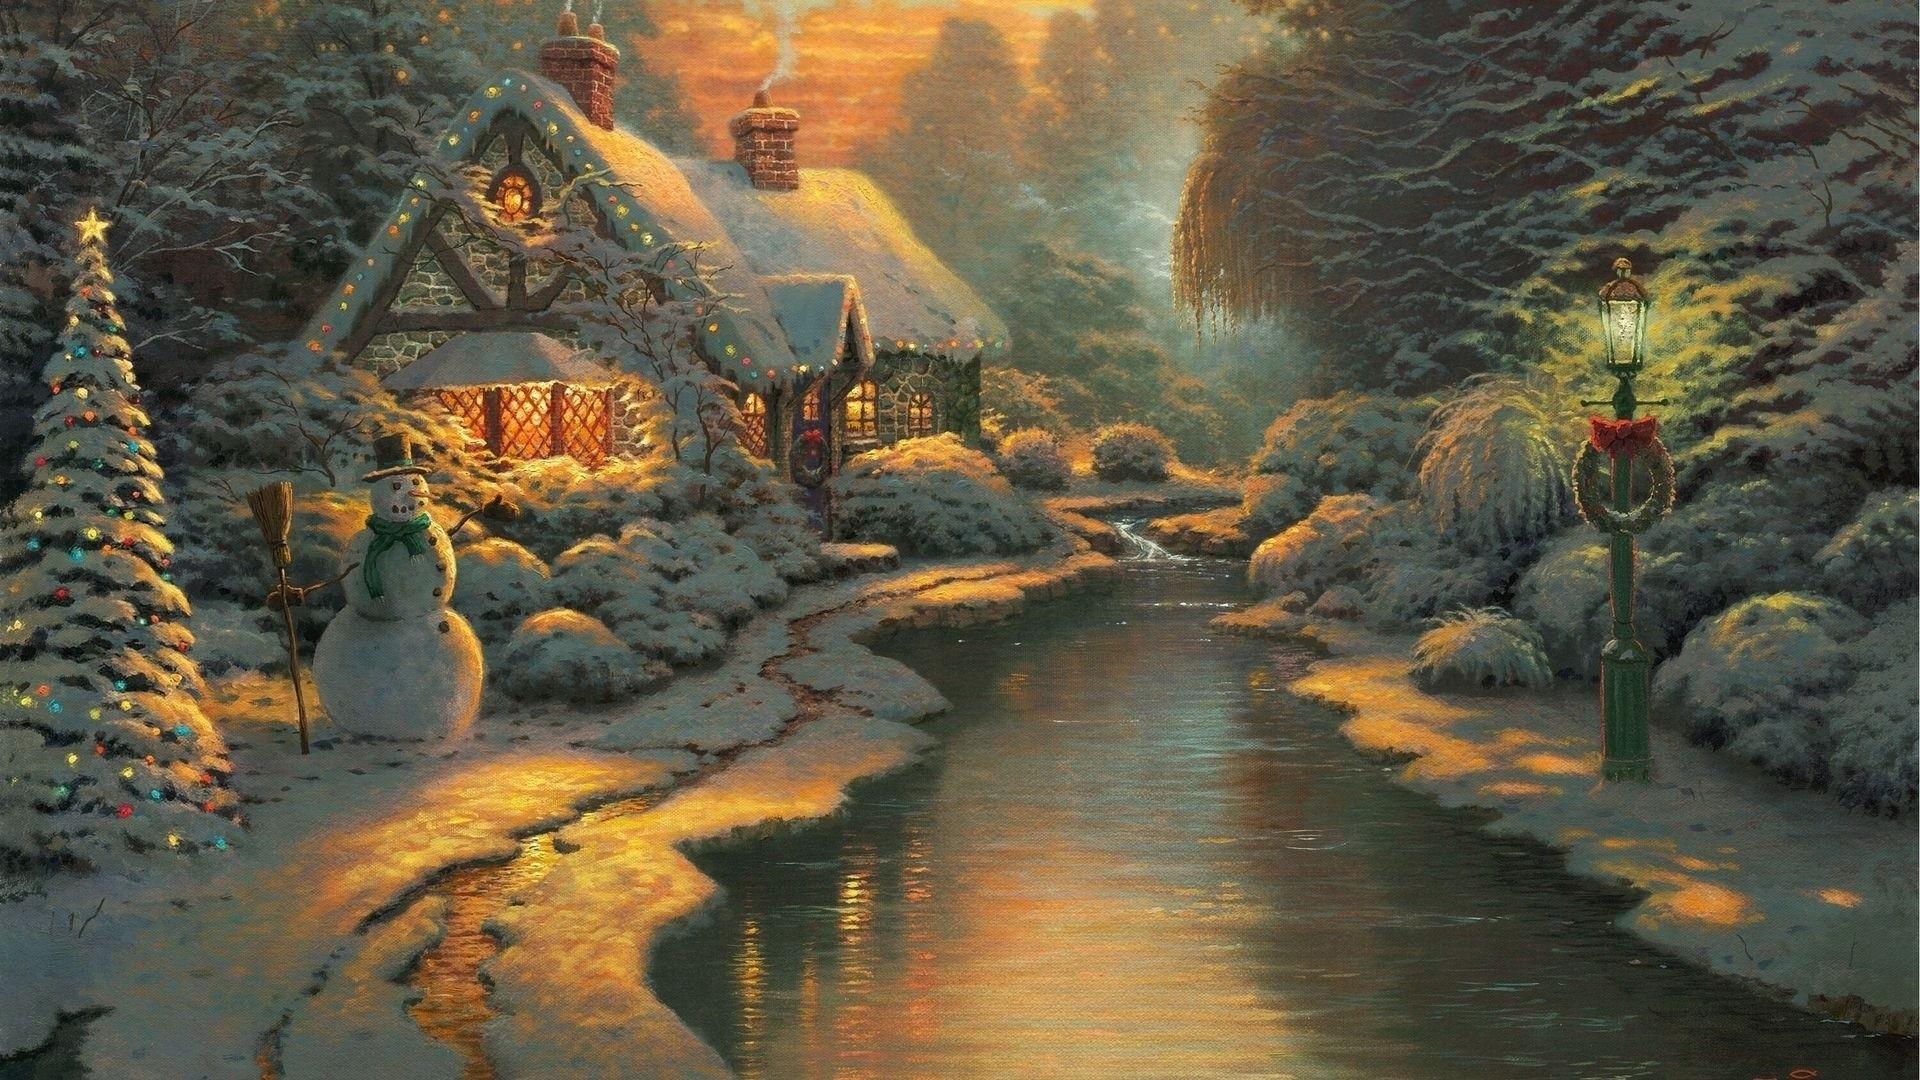 thomas kinkade christmas wallpaper (63+ images)